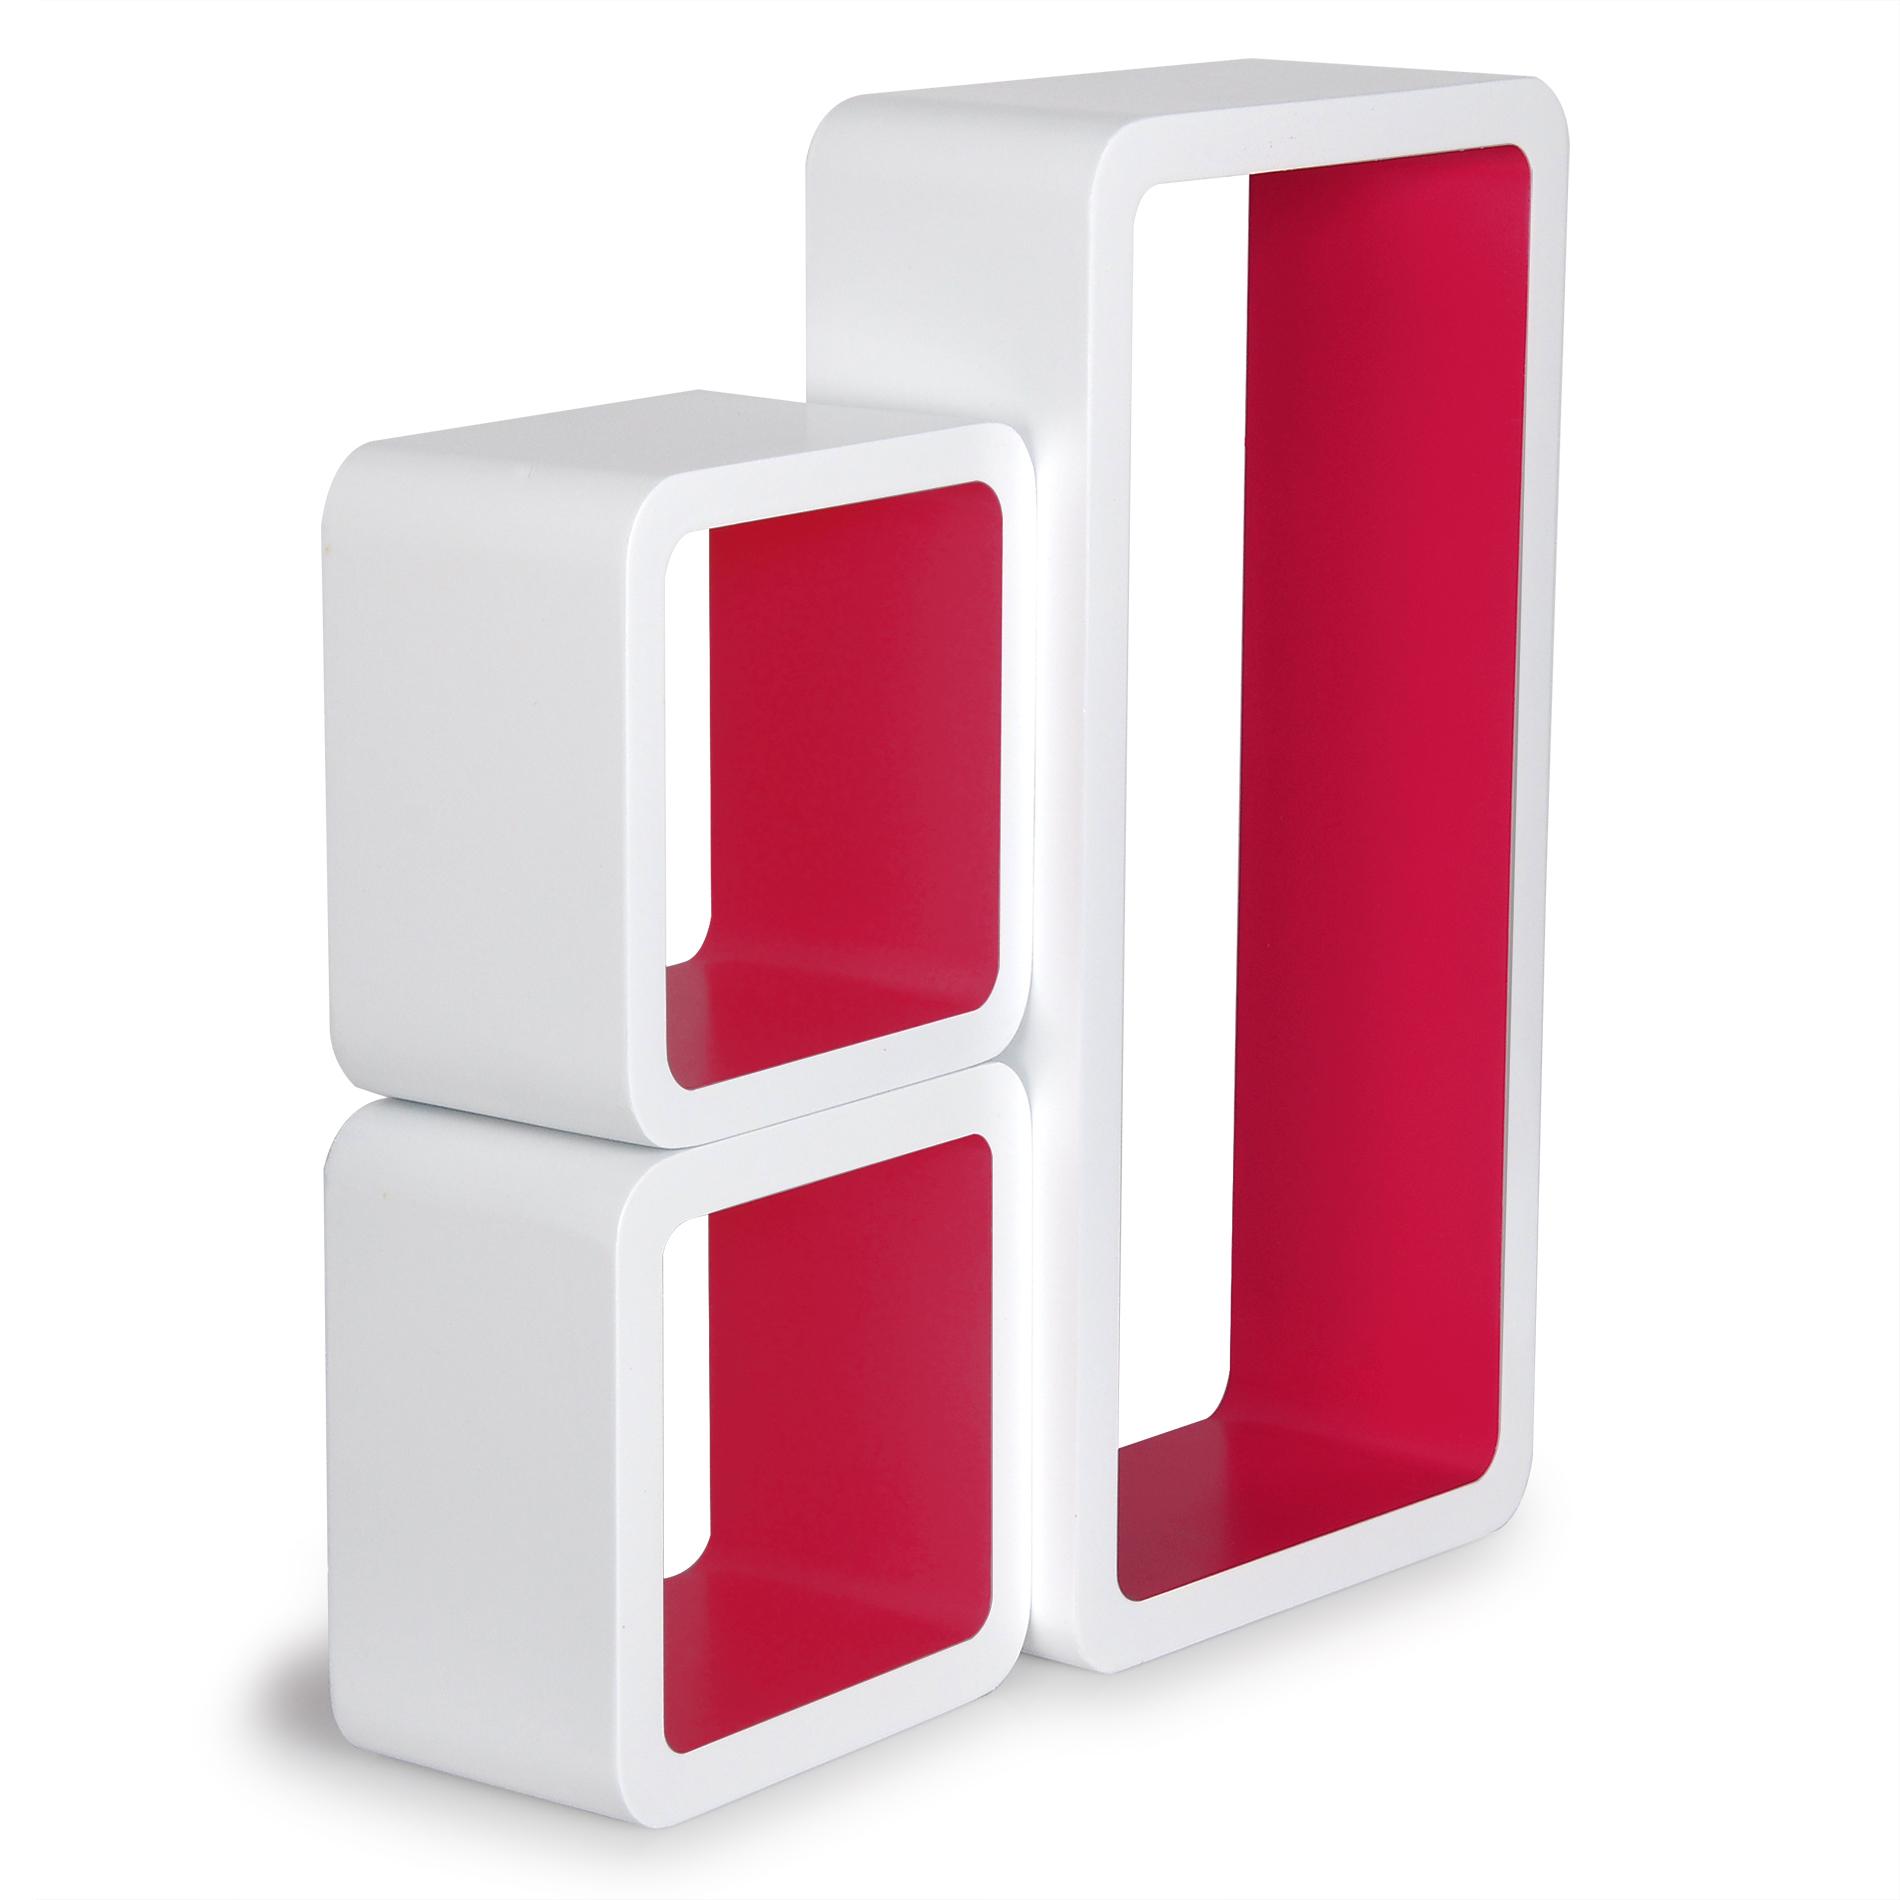 wandregal b roregal h ngeregal holz mdf b cherregal cube lounge cd regal e067 ebay. Black Bedroom Furniture Sets. Home Design Ideas